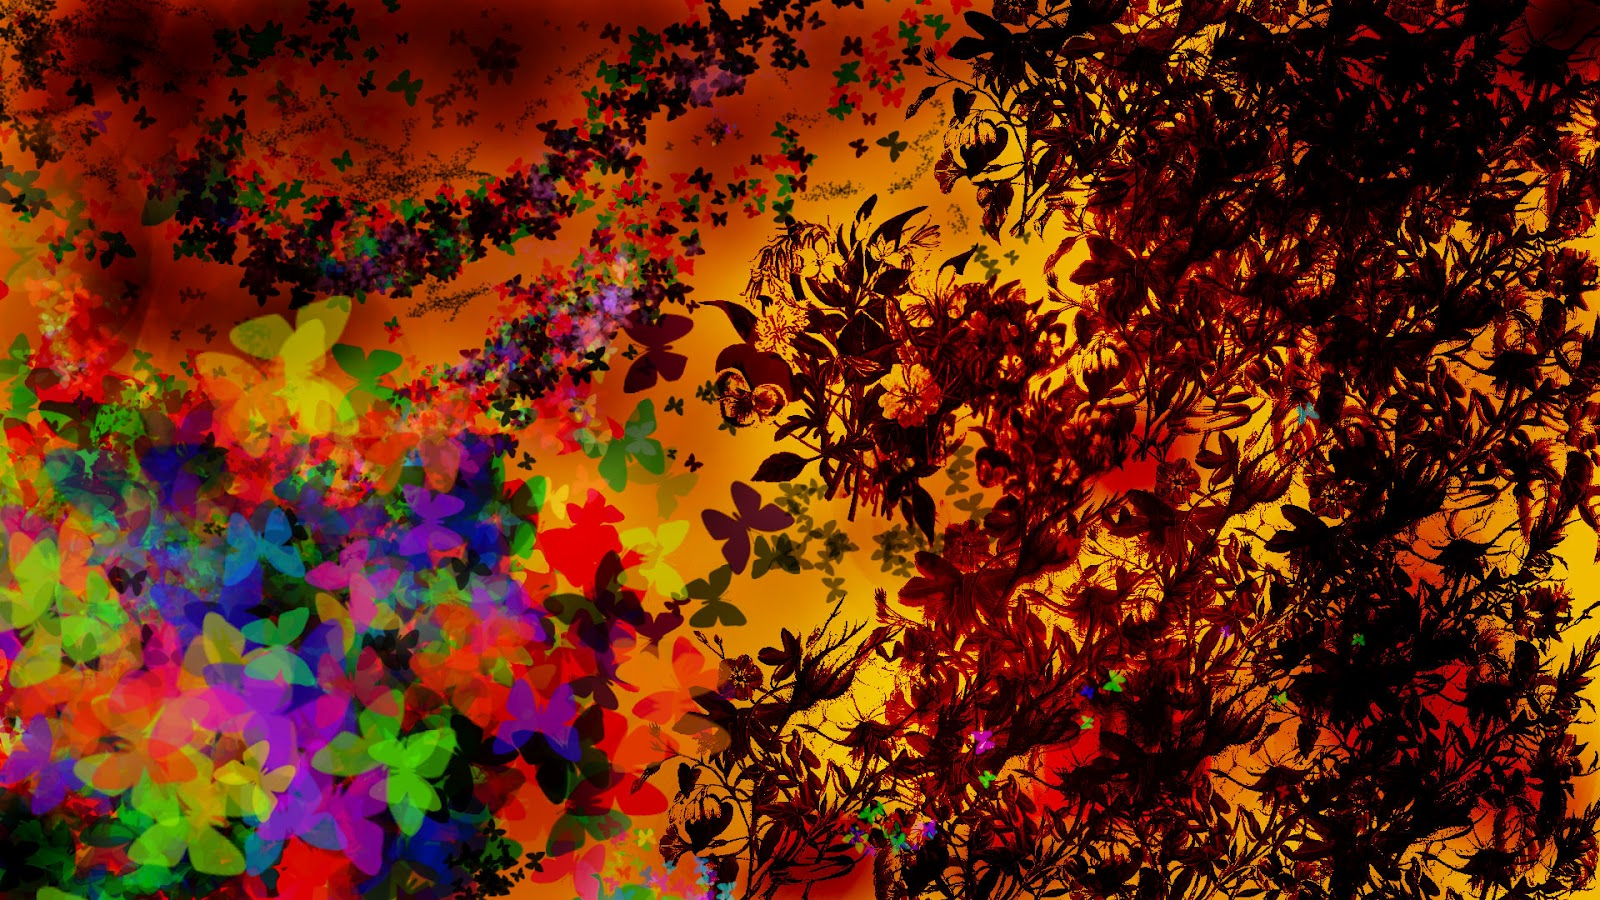 http://2.bp.blogspot.com/-Vxb83EHGaJM/T7SwbhCOAiI/AAAAAAAAANg/4cLE-ShZXlU/s1600/Window-7-HD-Wallpapers-Butterfly\'s-3D.jpg